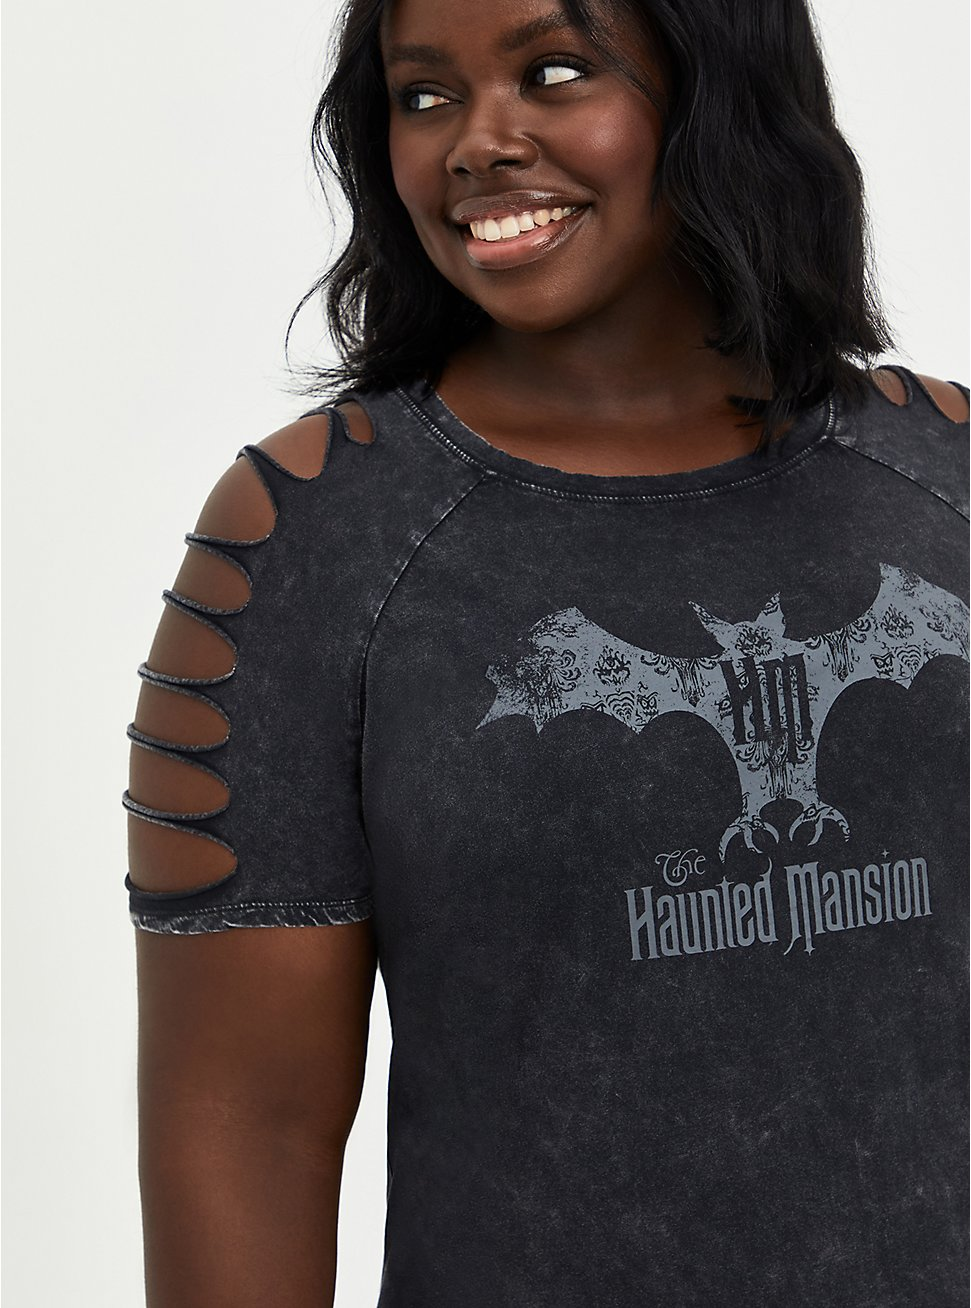 Disney Haunted Mansion Bat Slash Top - Mineral Wash Black, DEEP BLACK, hi-res